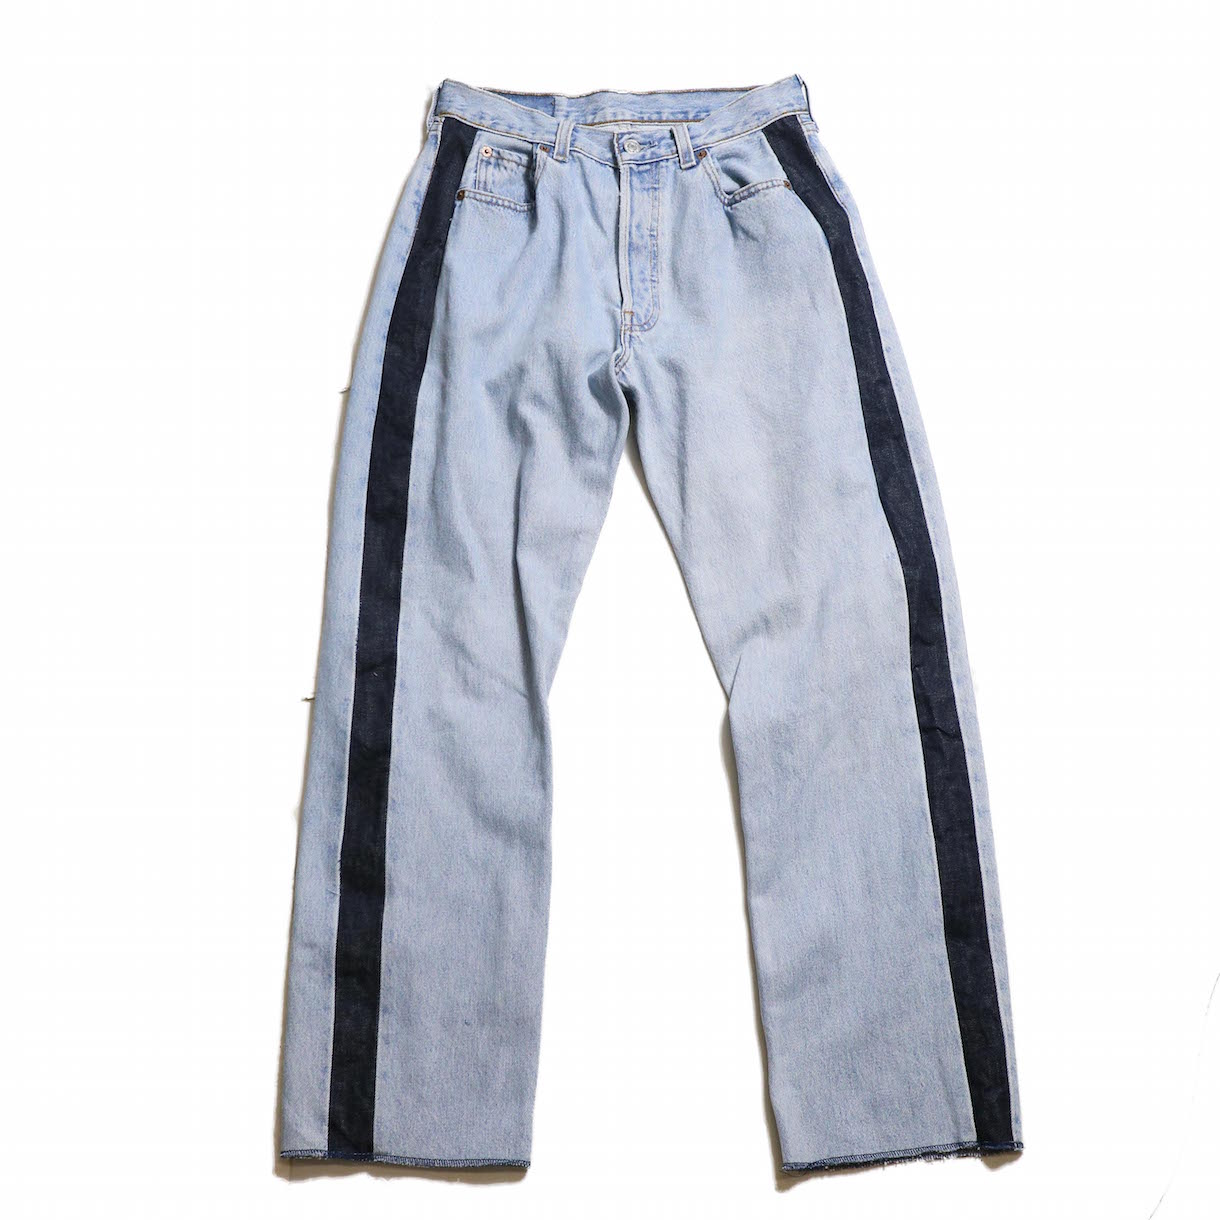 BONUM / SIDE LINE 5P DENIM PANTS(28incA